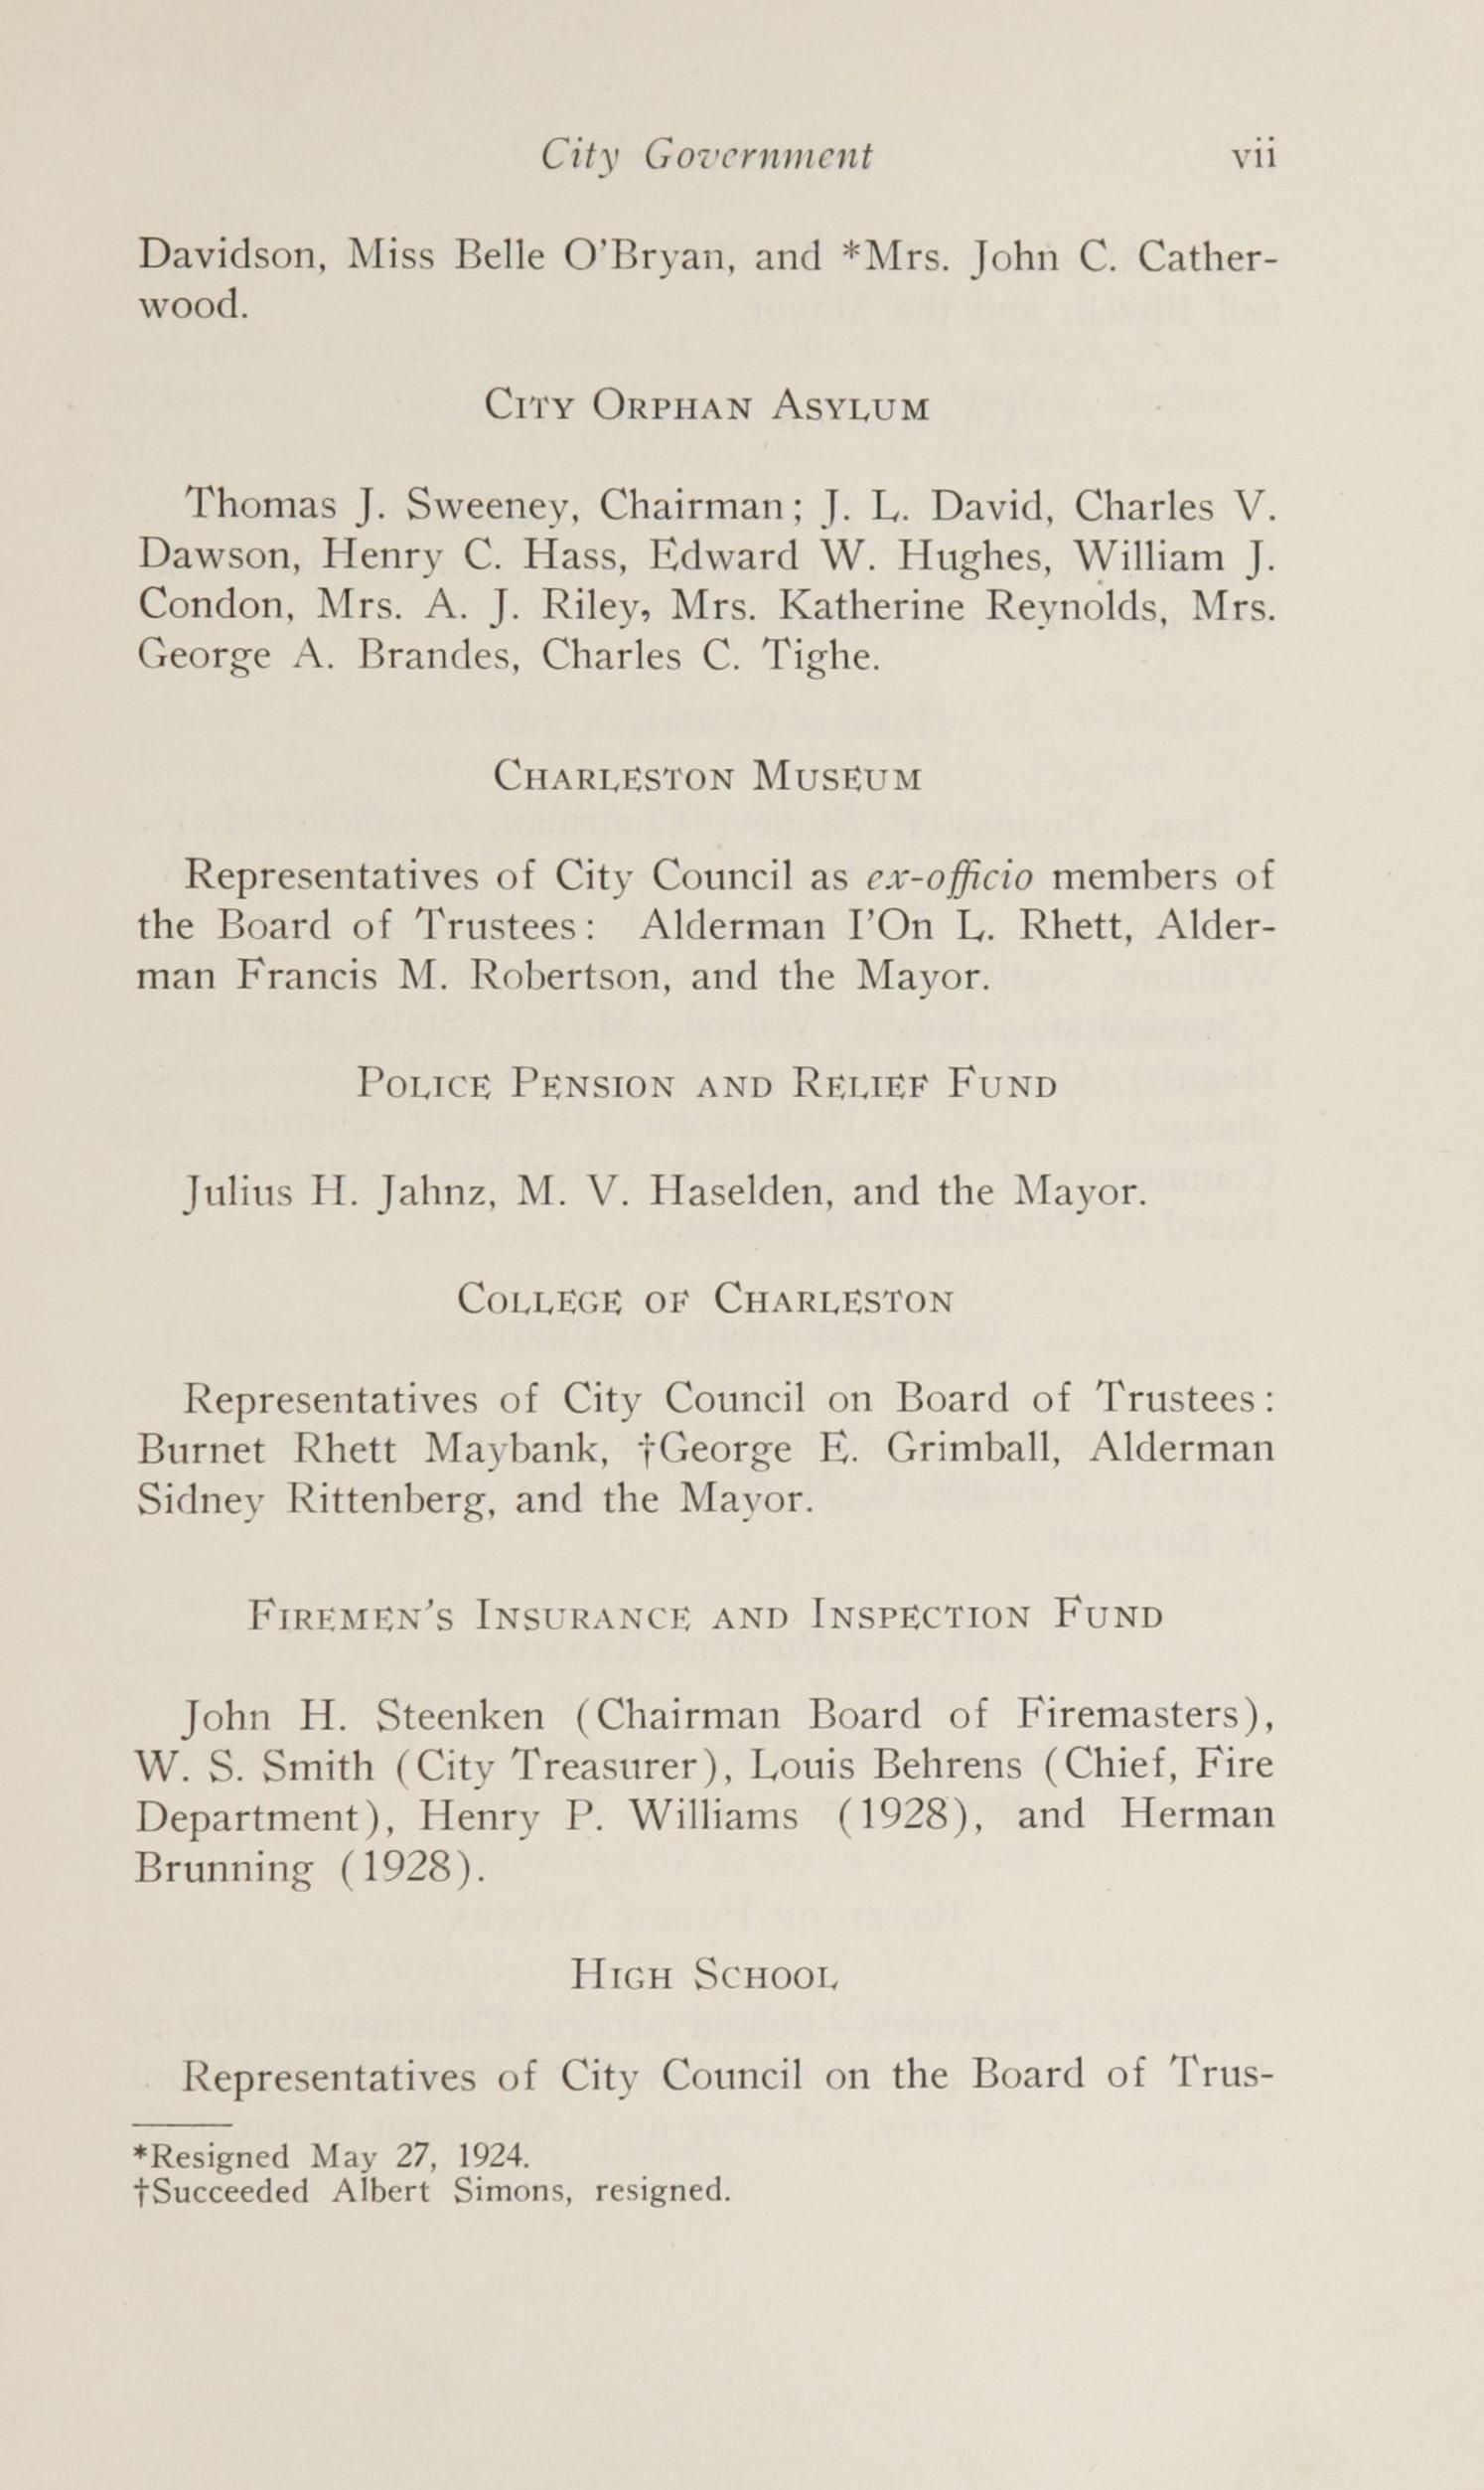 Charleston Yearbook, 1924, page vii